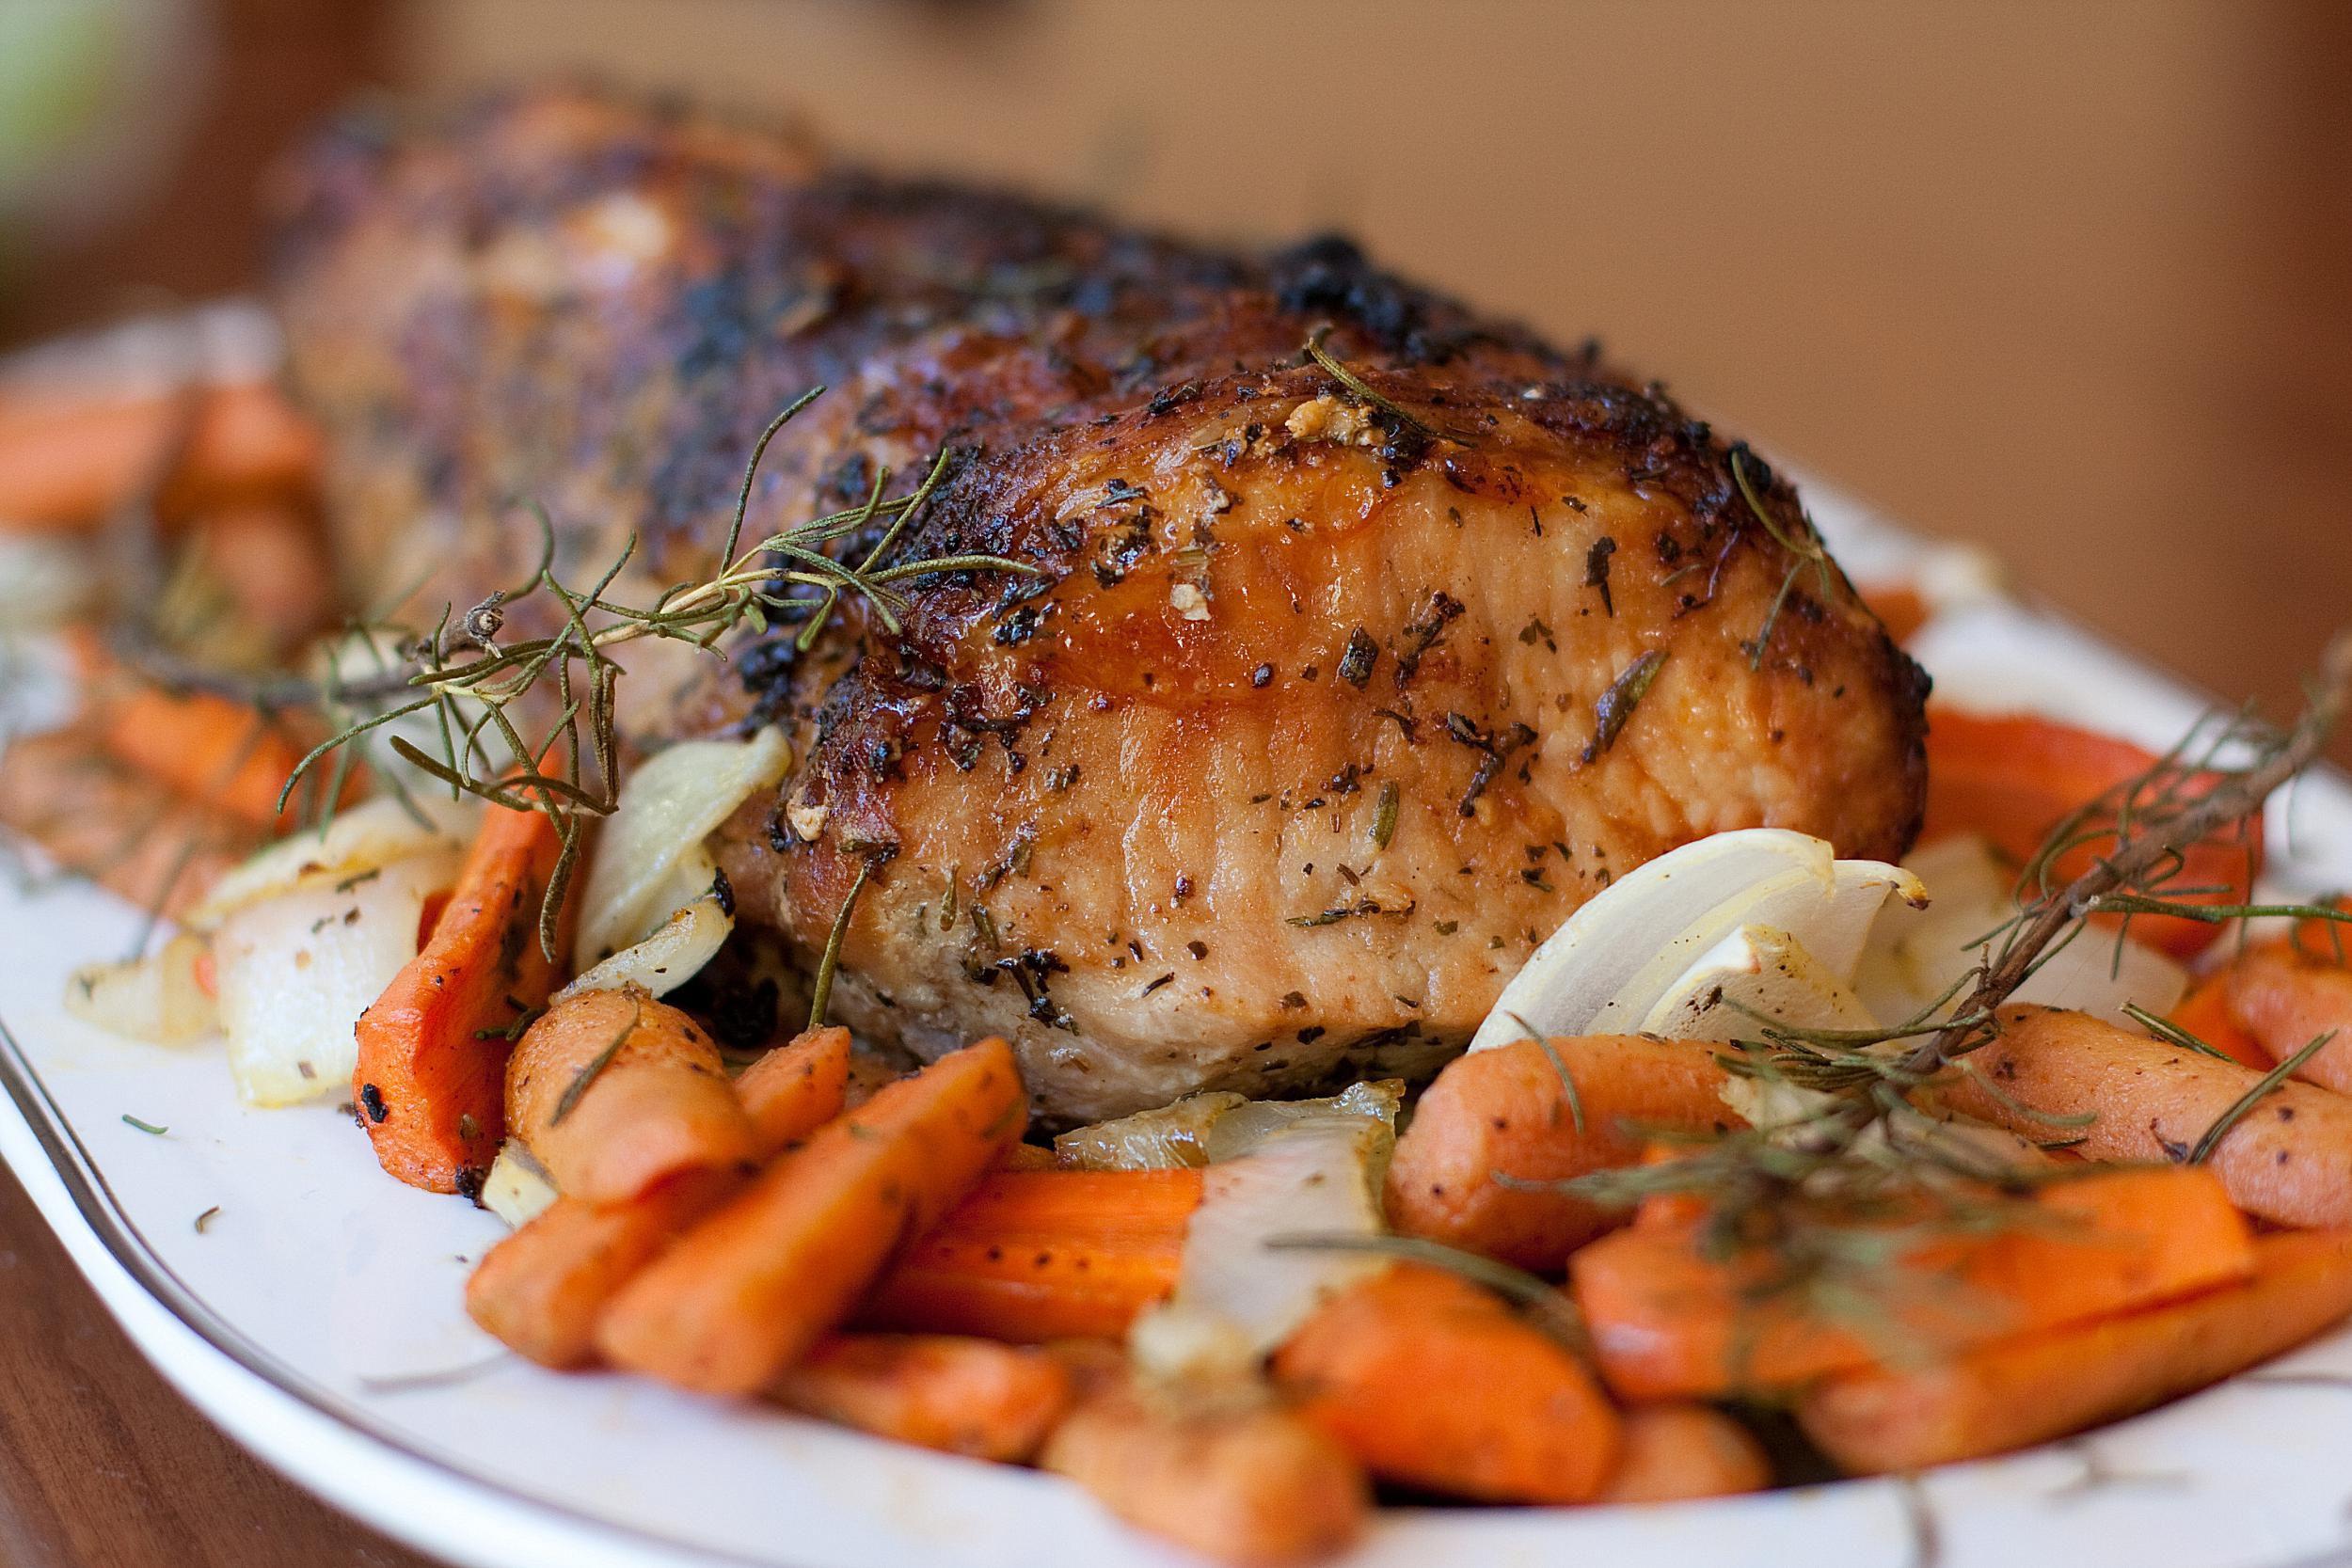 How To Cook A Pork Loin Roast  Roasted Boneless Pork Loin Recipe